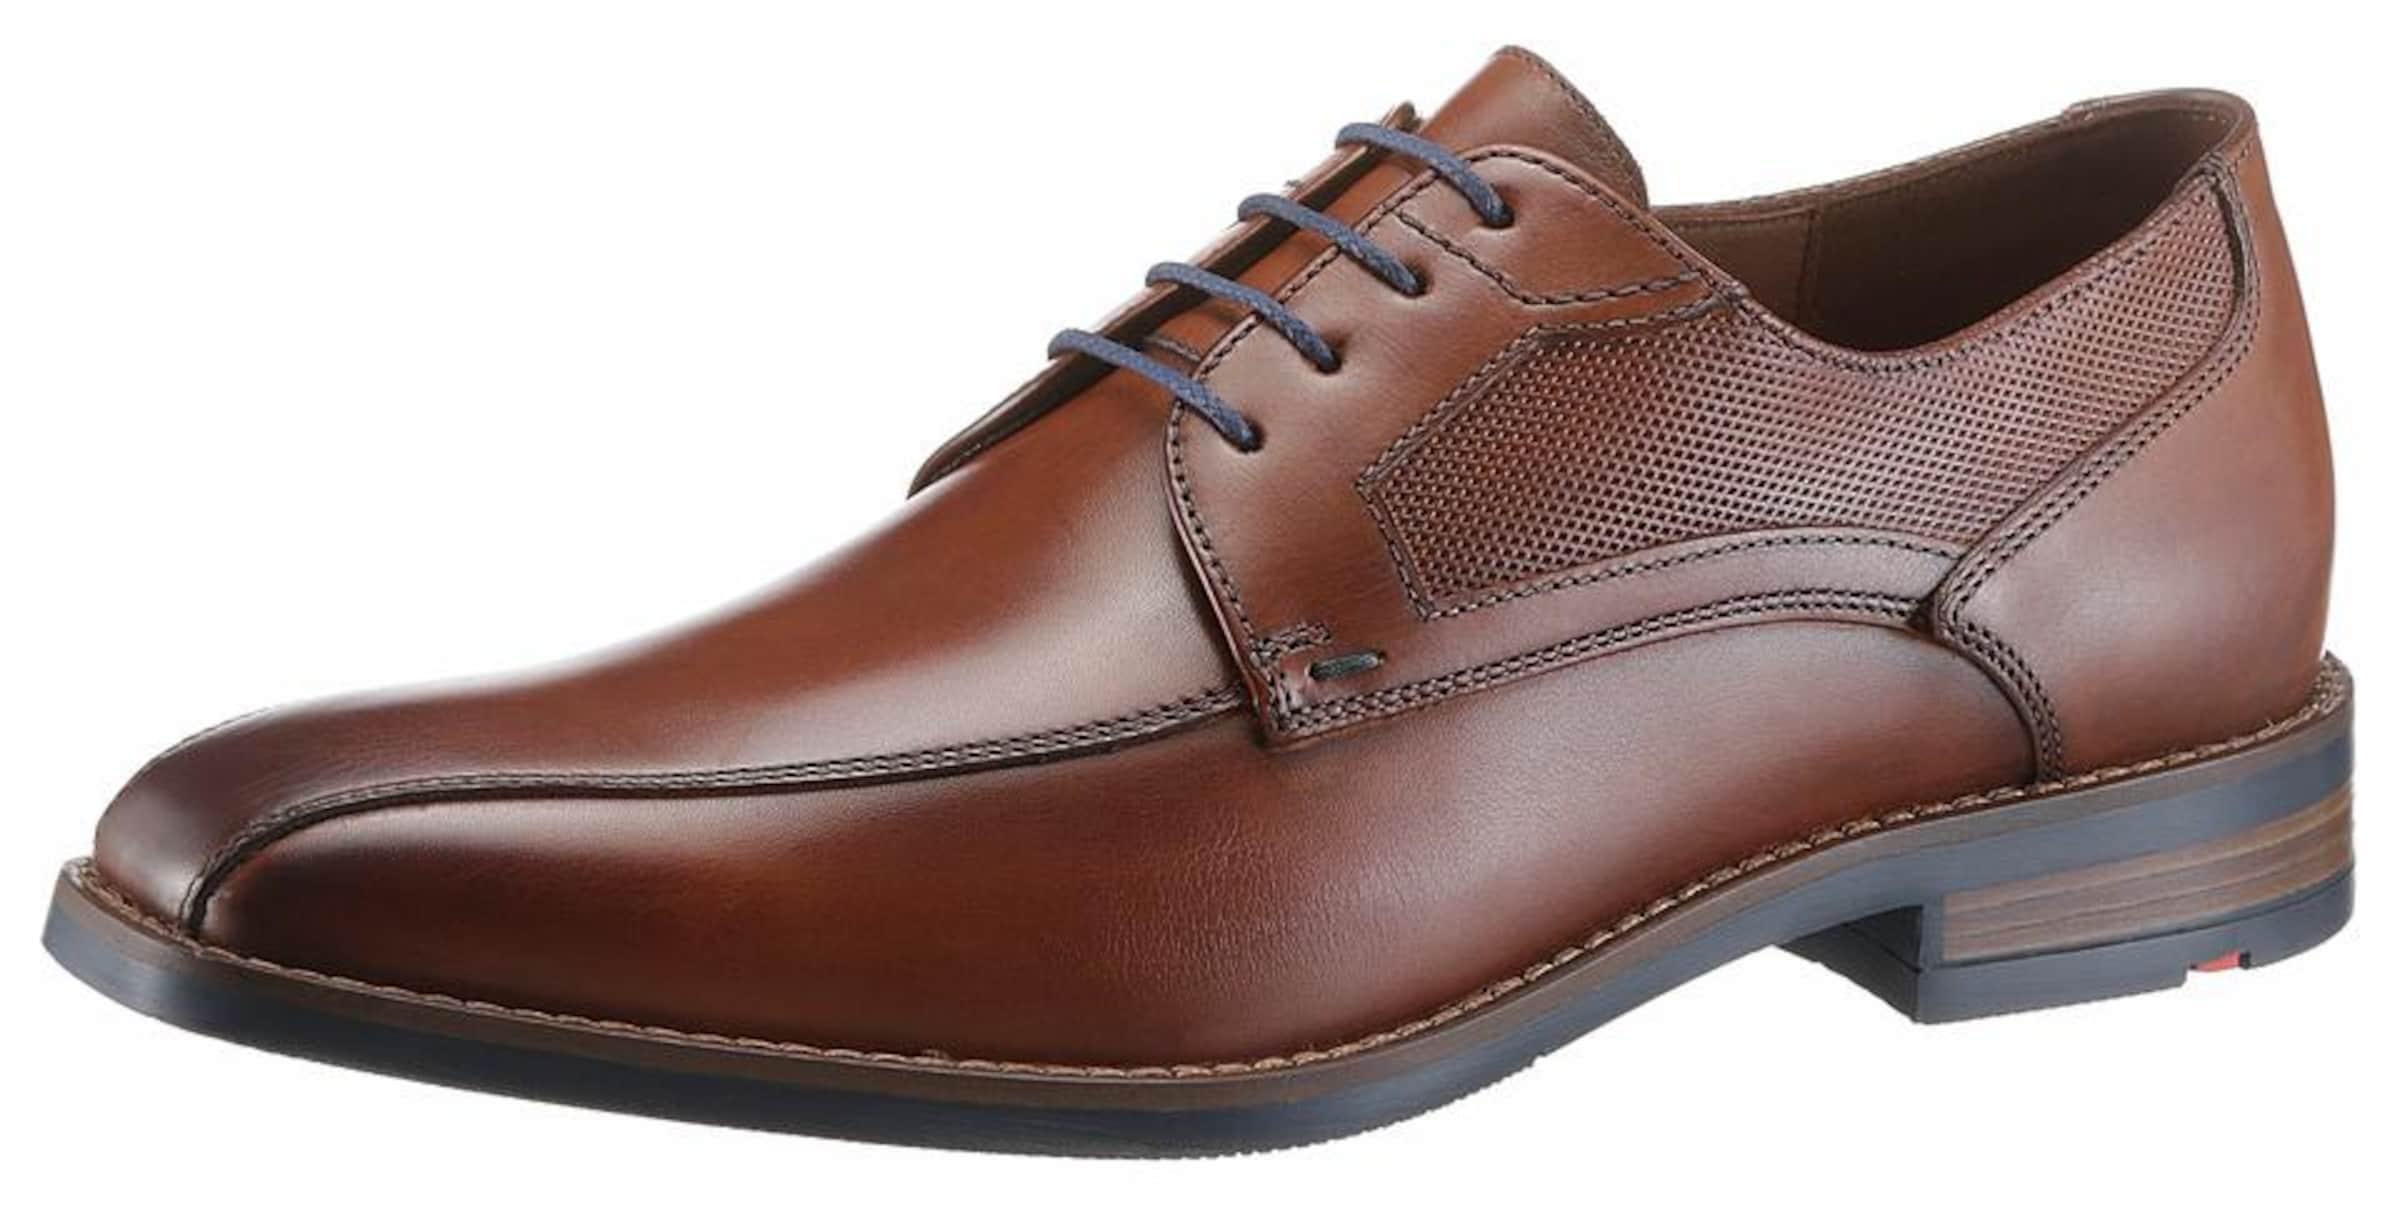 Haltbare Mode billige Schuhe LLOYD   Schnürschuh Schuhe Gut getragene getragene getragene Schuhe fd0785